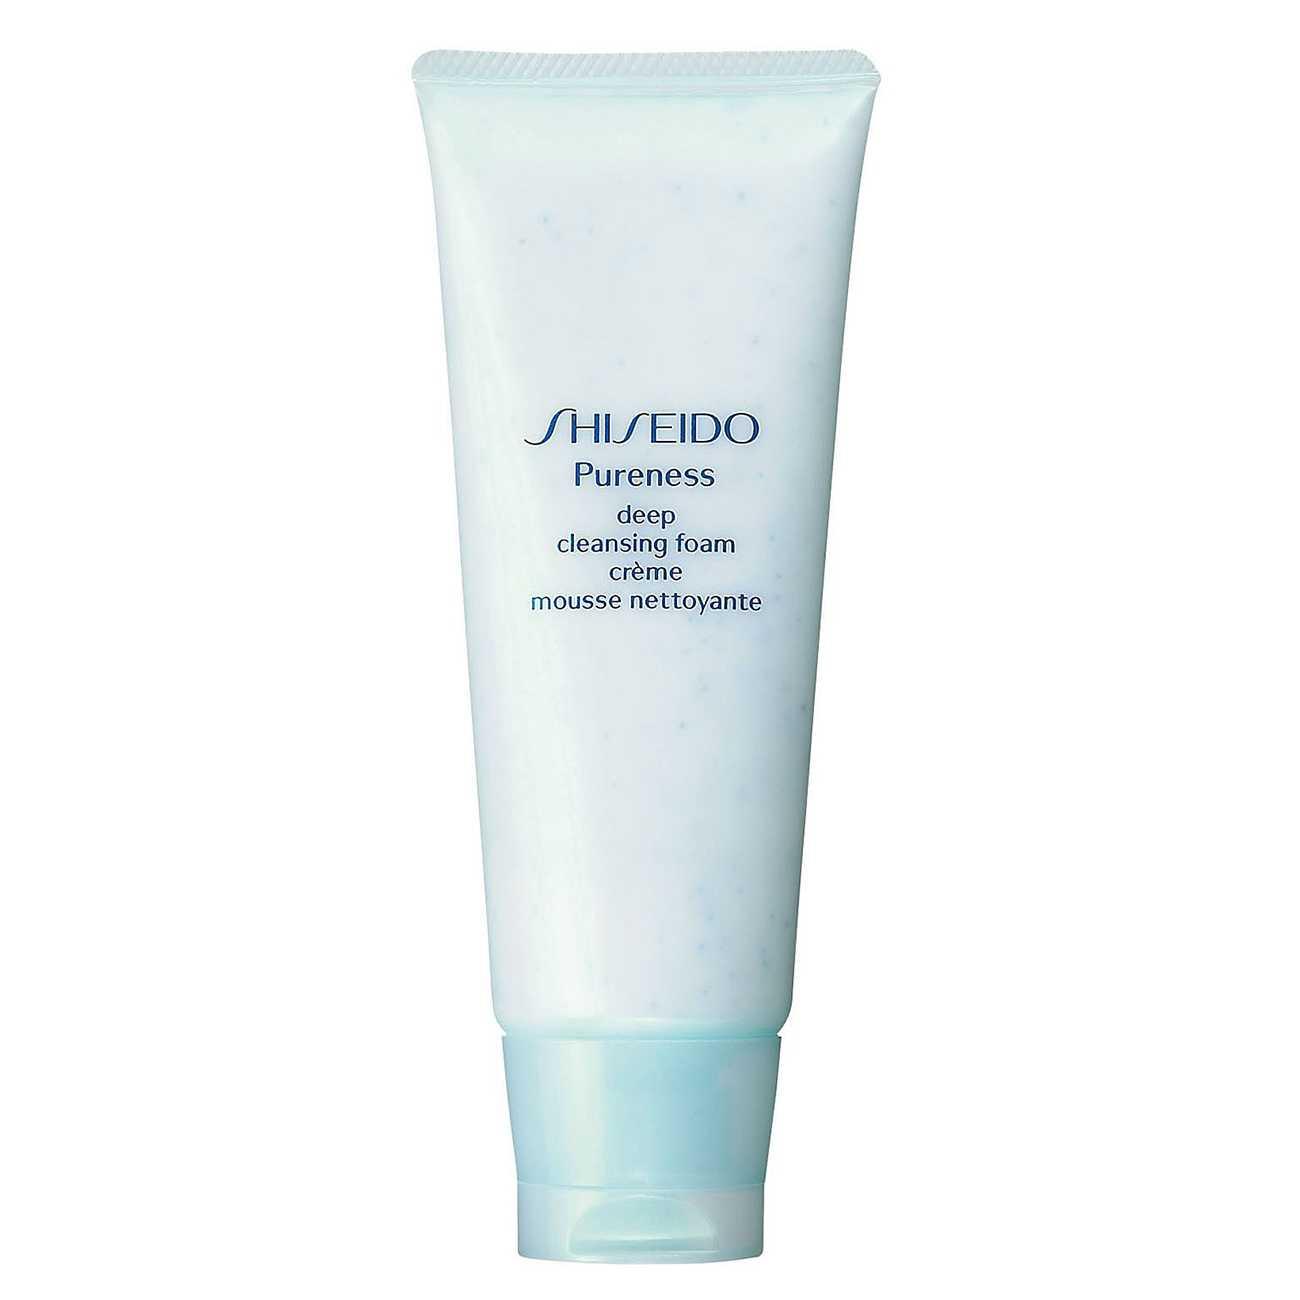 Pureness Deep Cleansing Foam 100 Ml Shiseido imagine 2021 bestvalue.eu